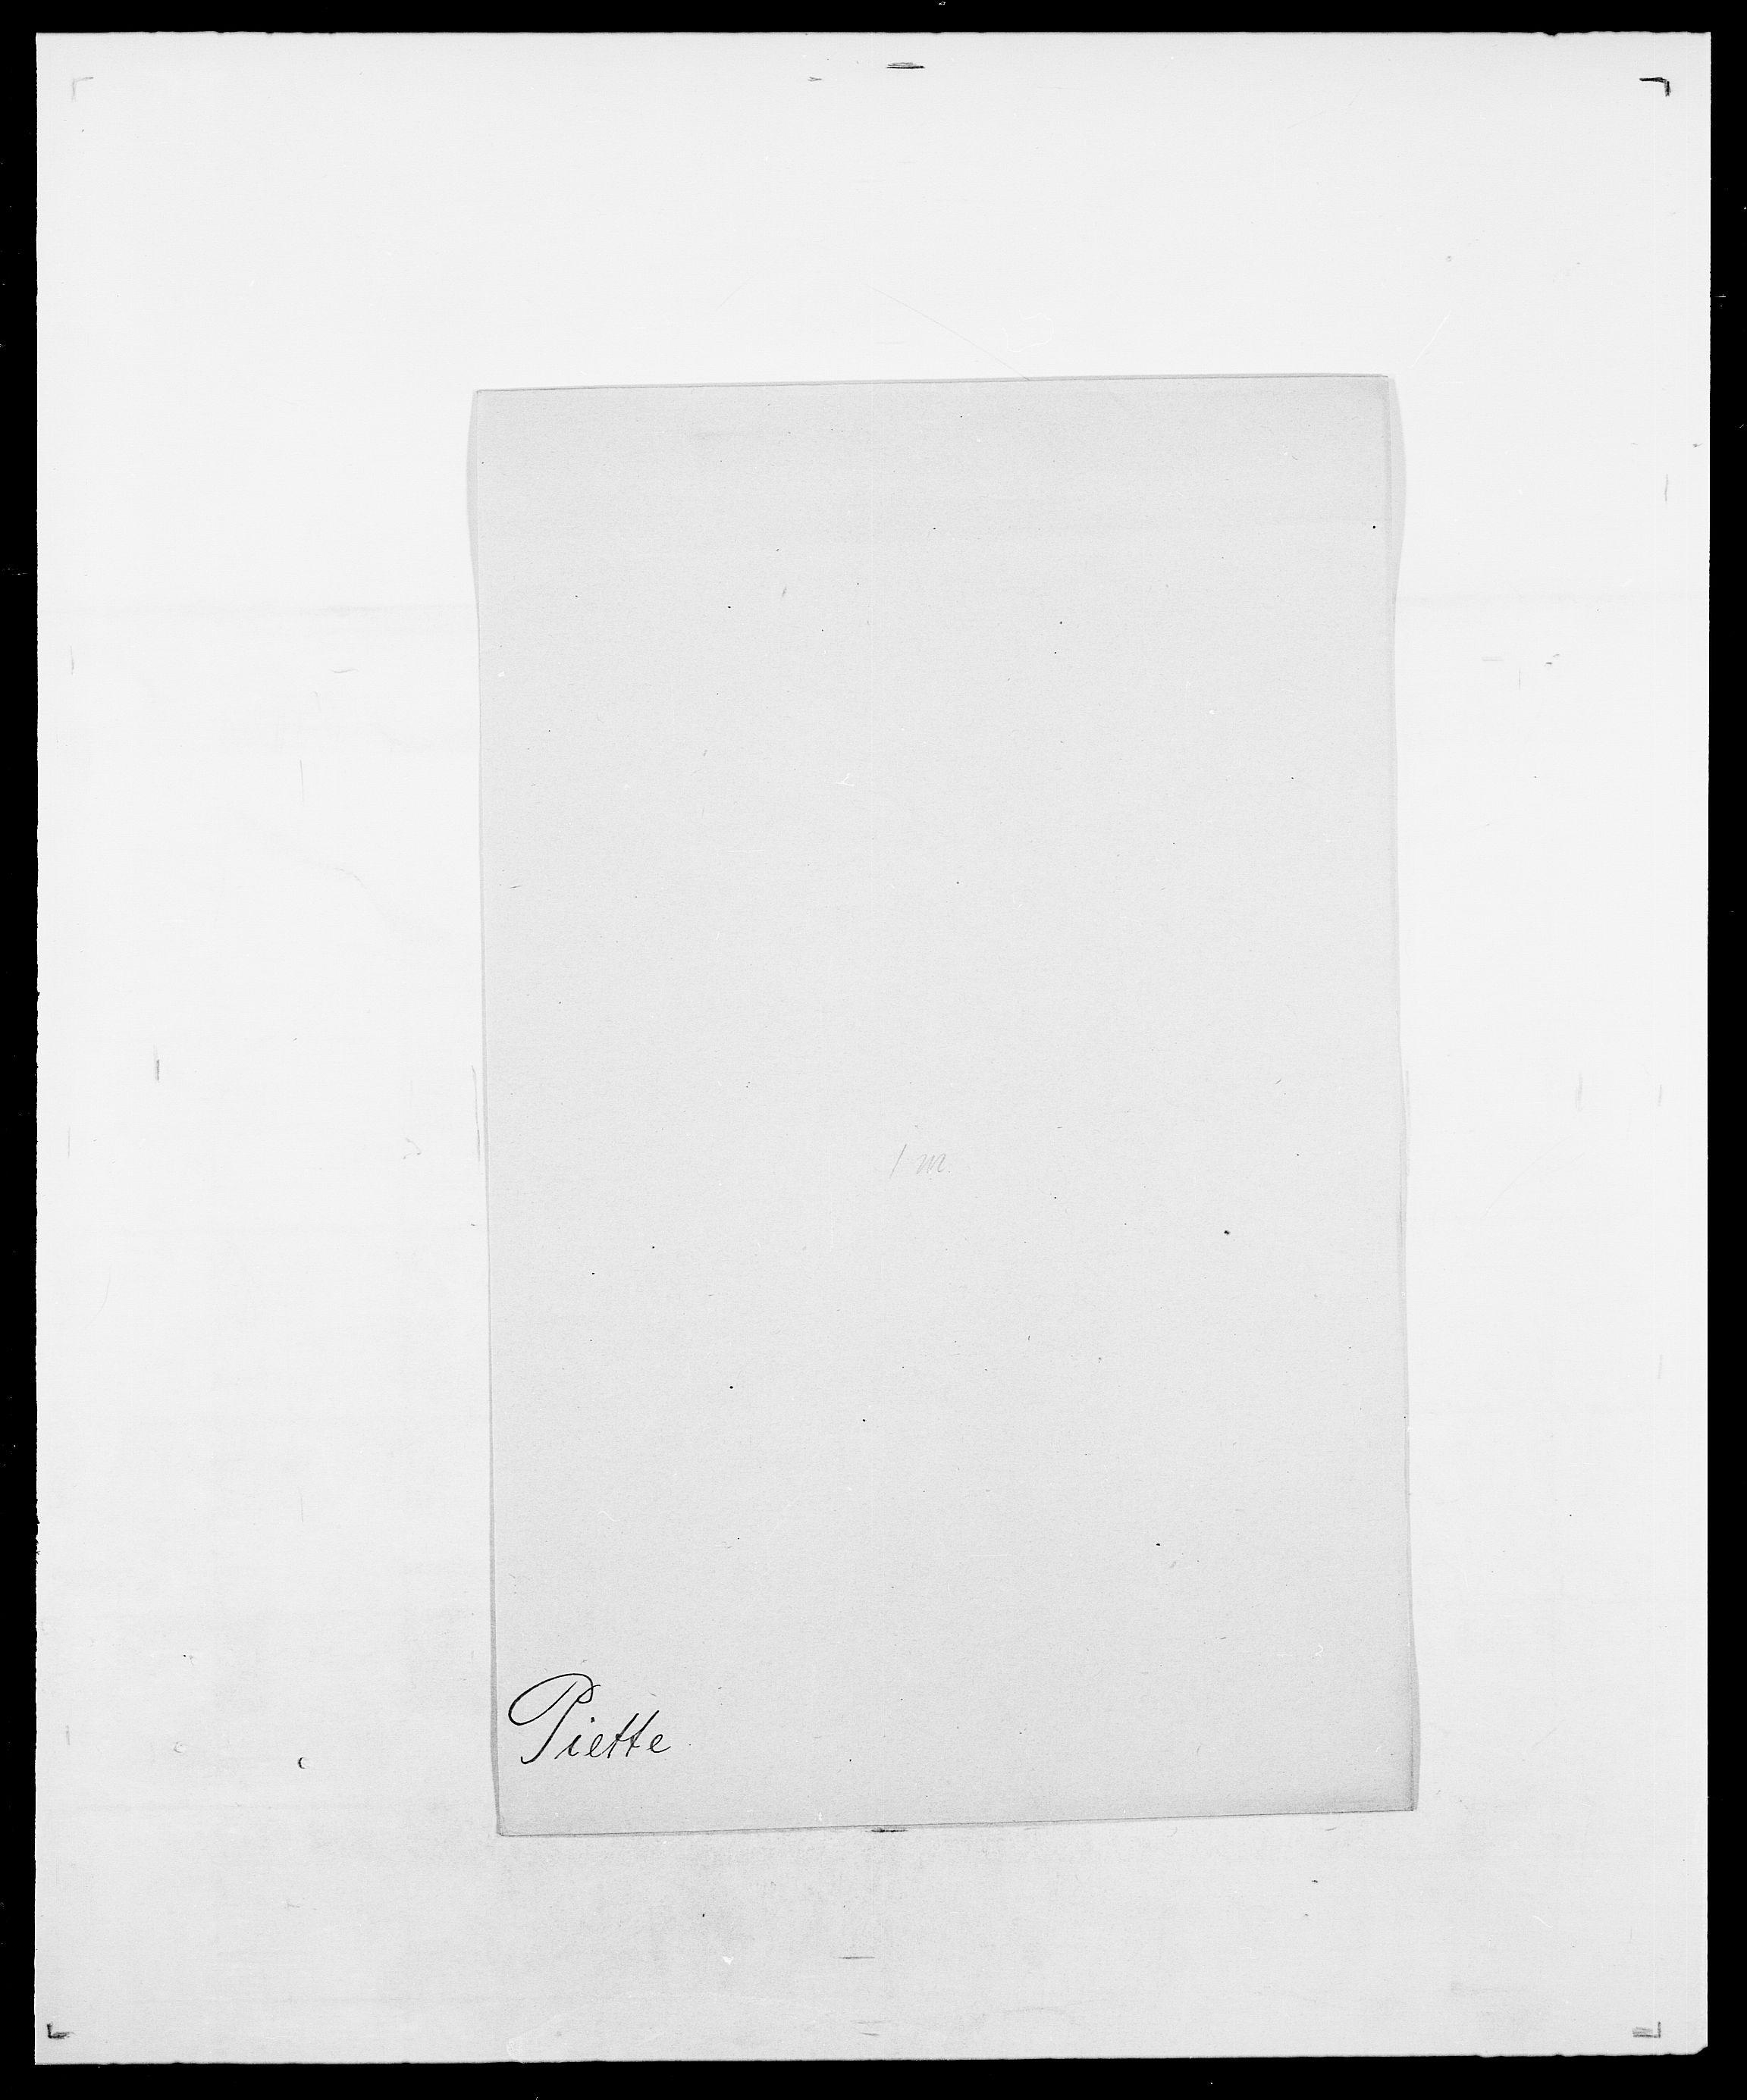 SAO, Delgobe, Charles Antoine - samling, D/Da/L0030: Paars - Pittelkov, s. 530